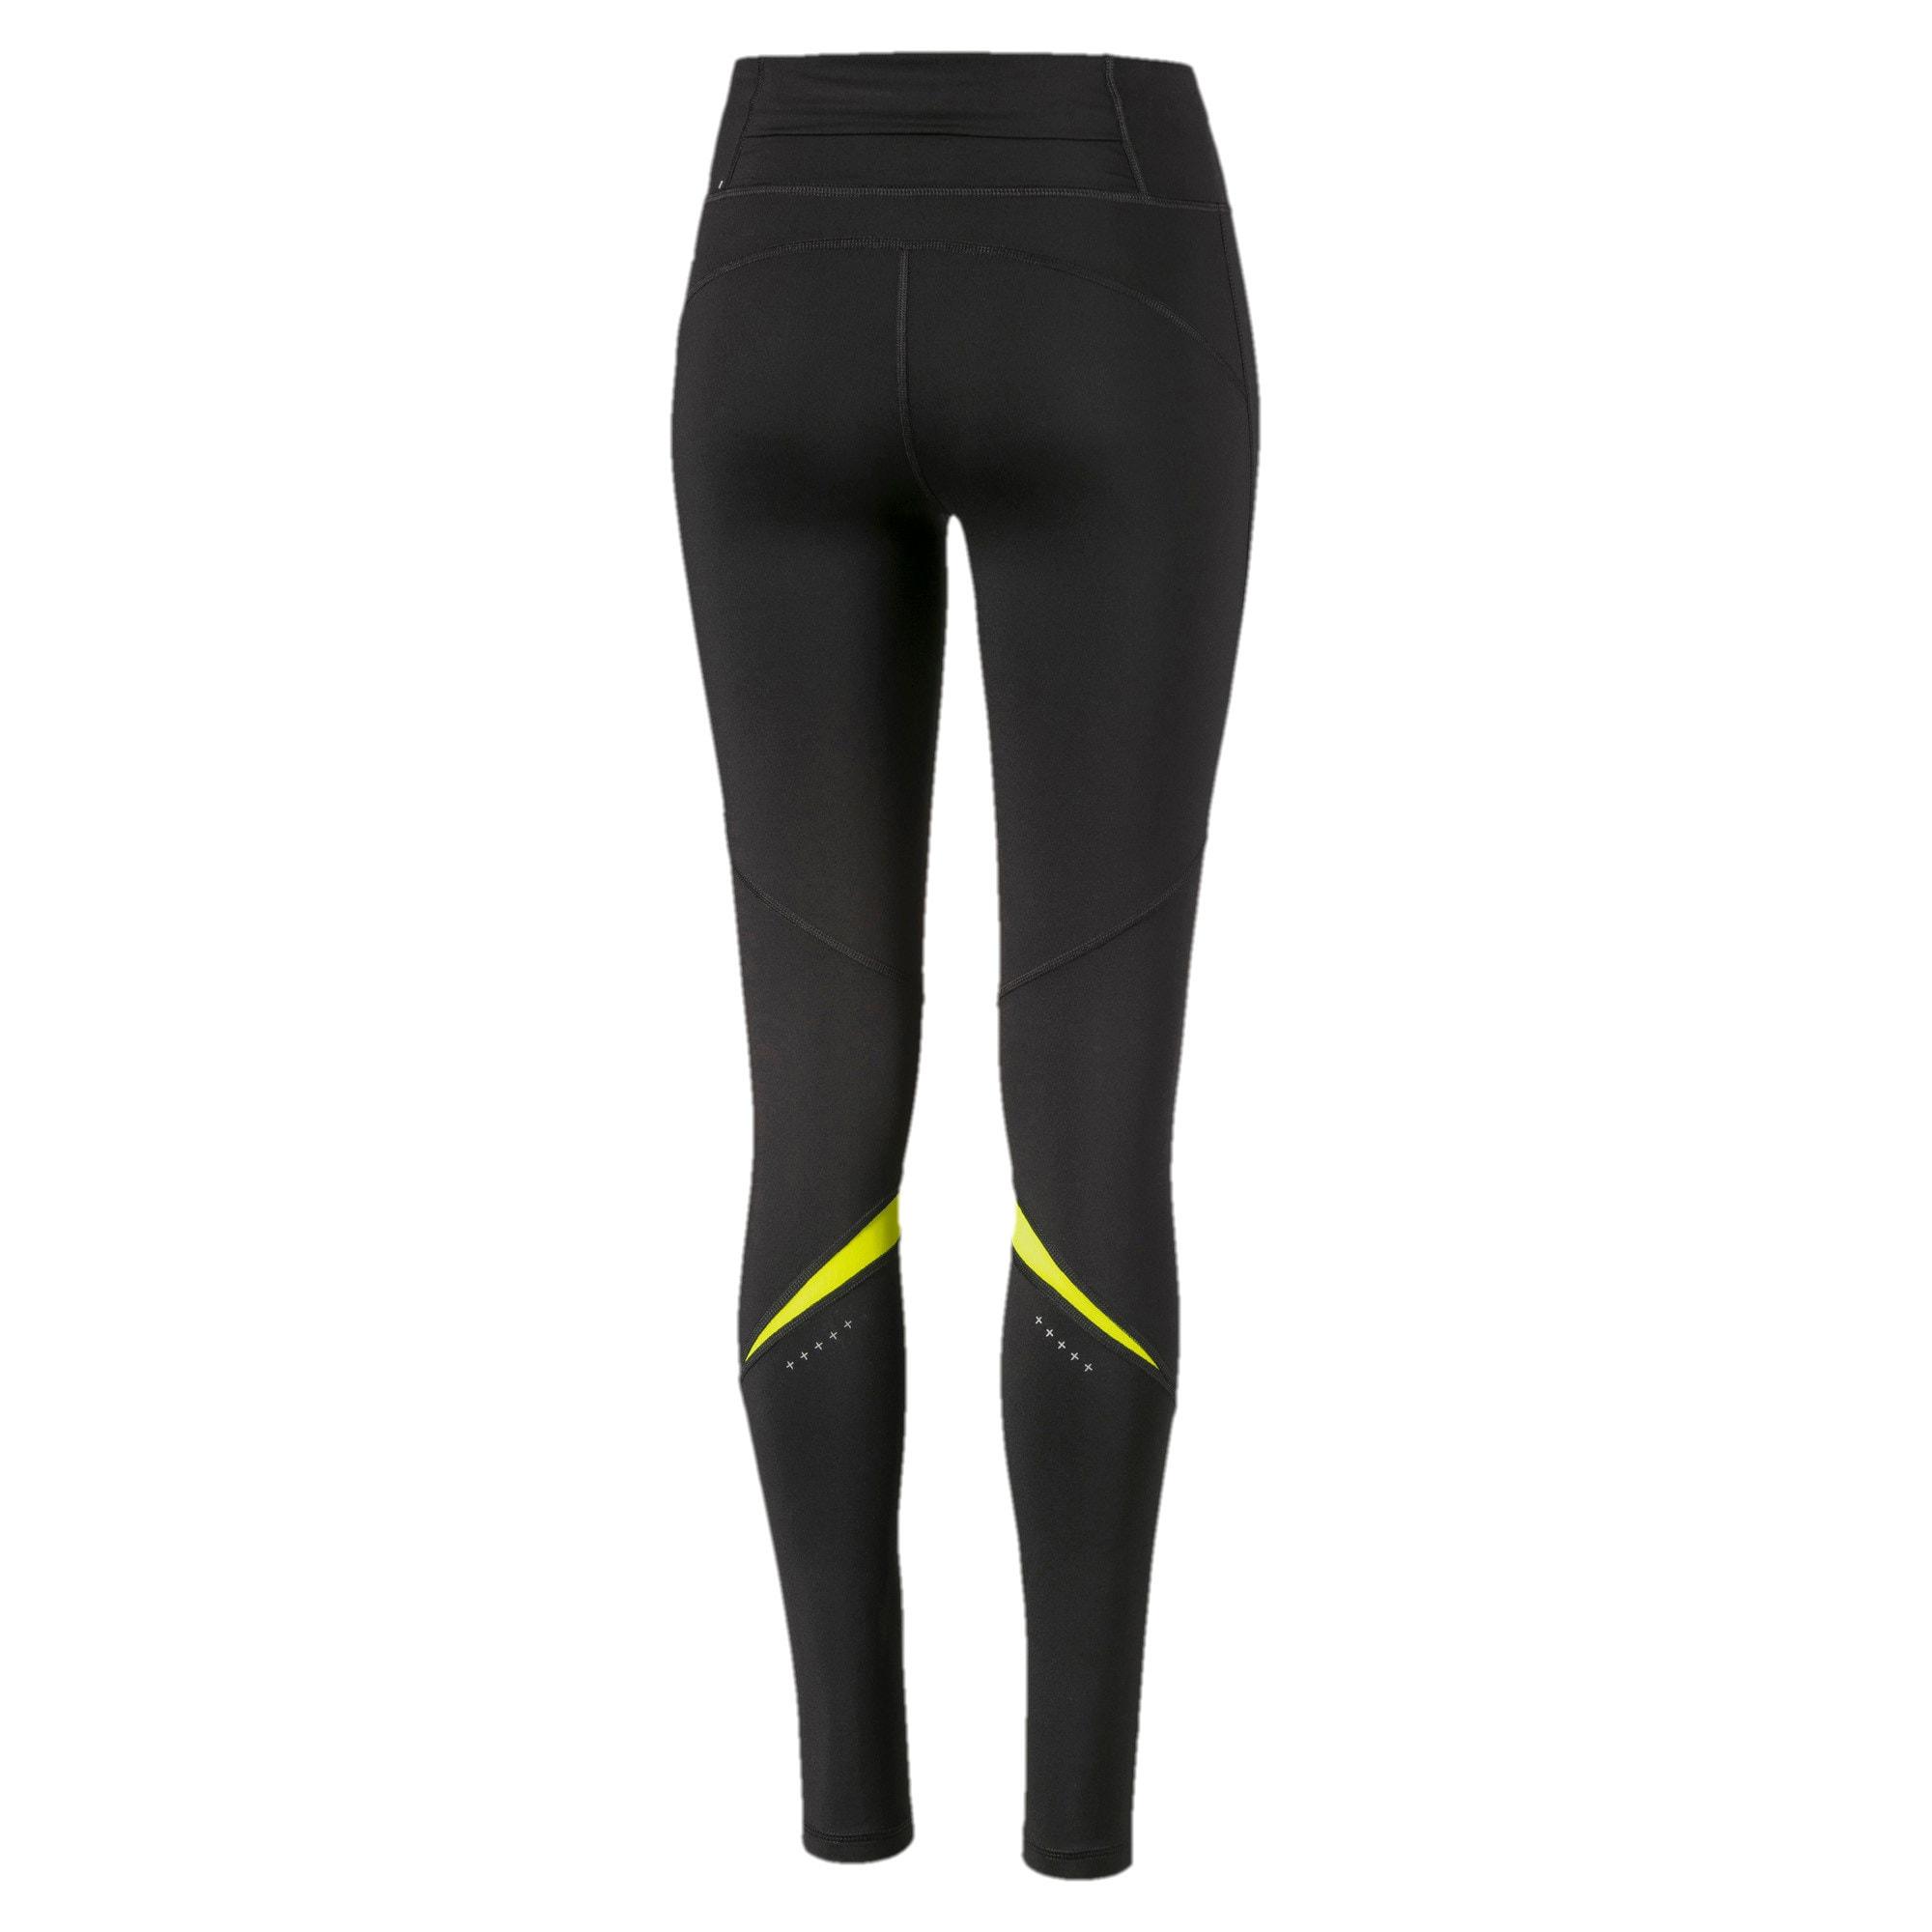 Miniatura 5 de Leggings largosIgnite para mujer, Puma Black-Yellow Alert, mediano